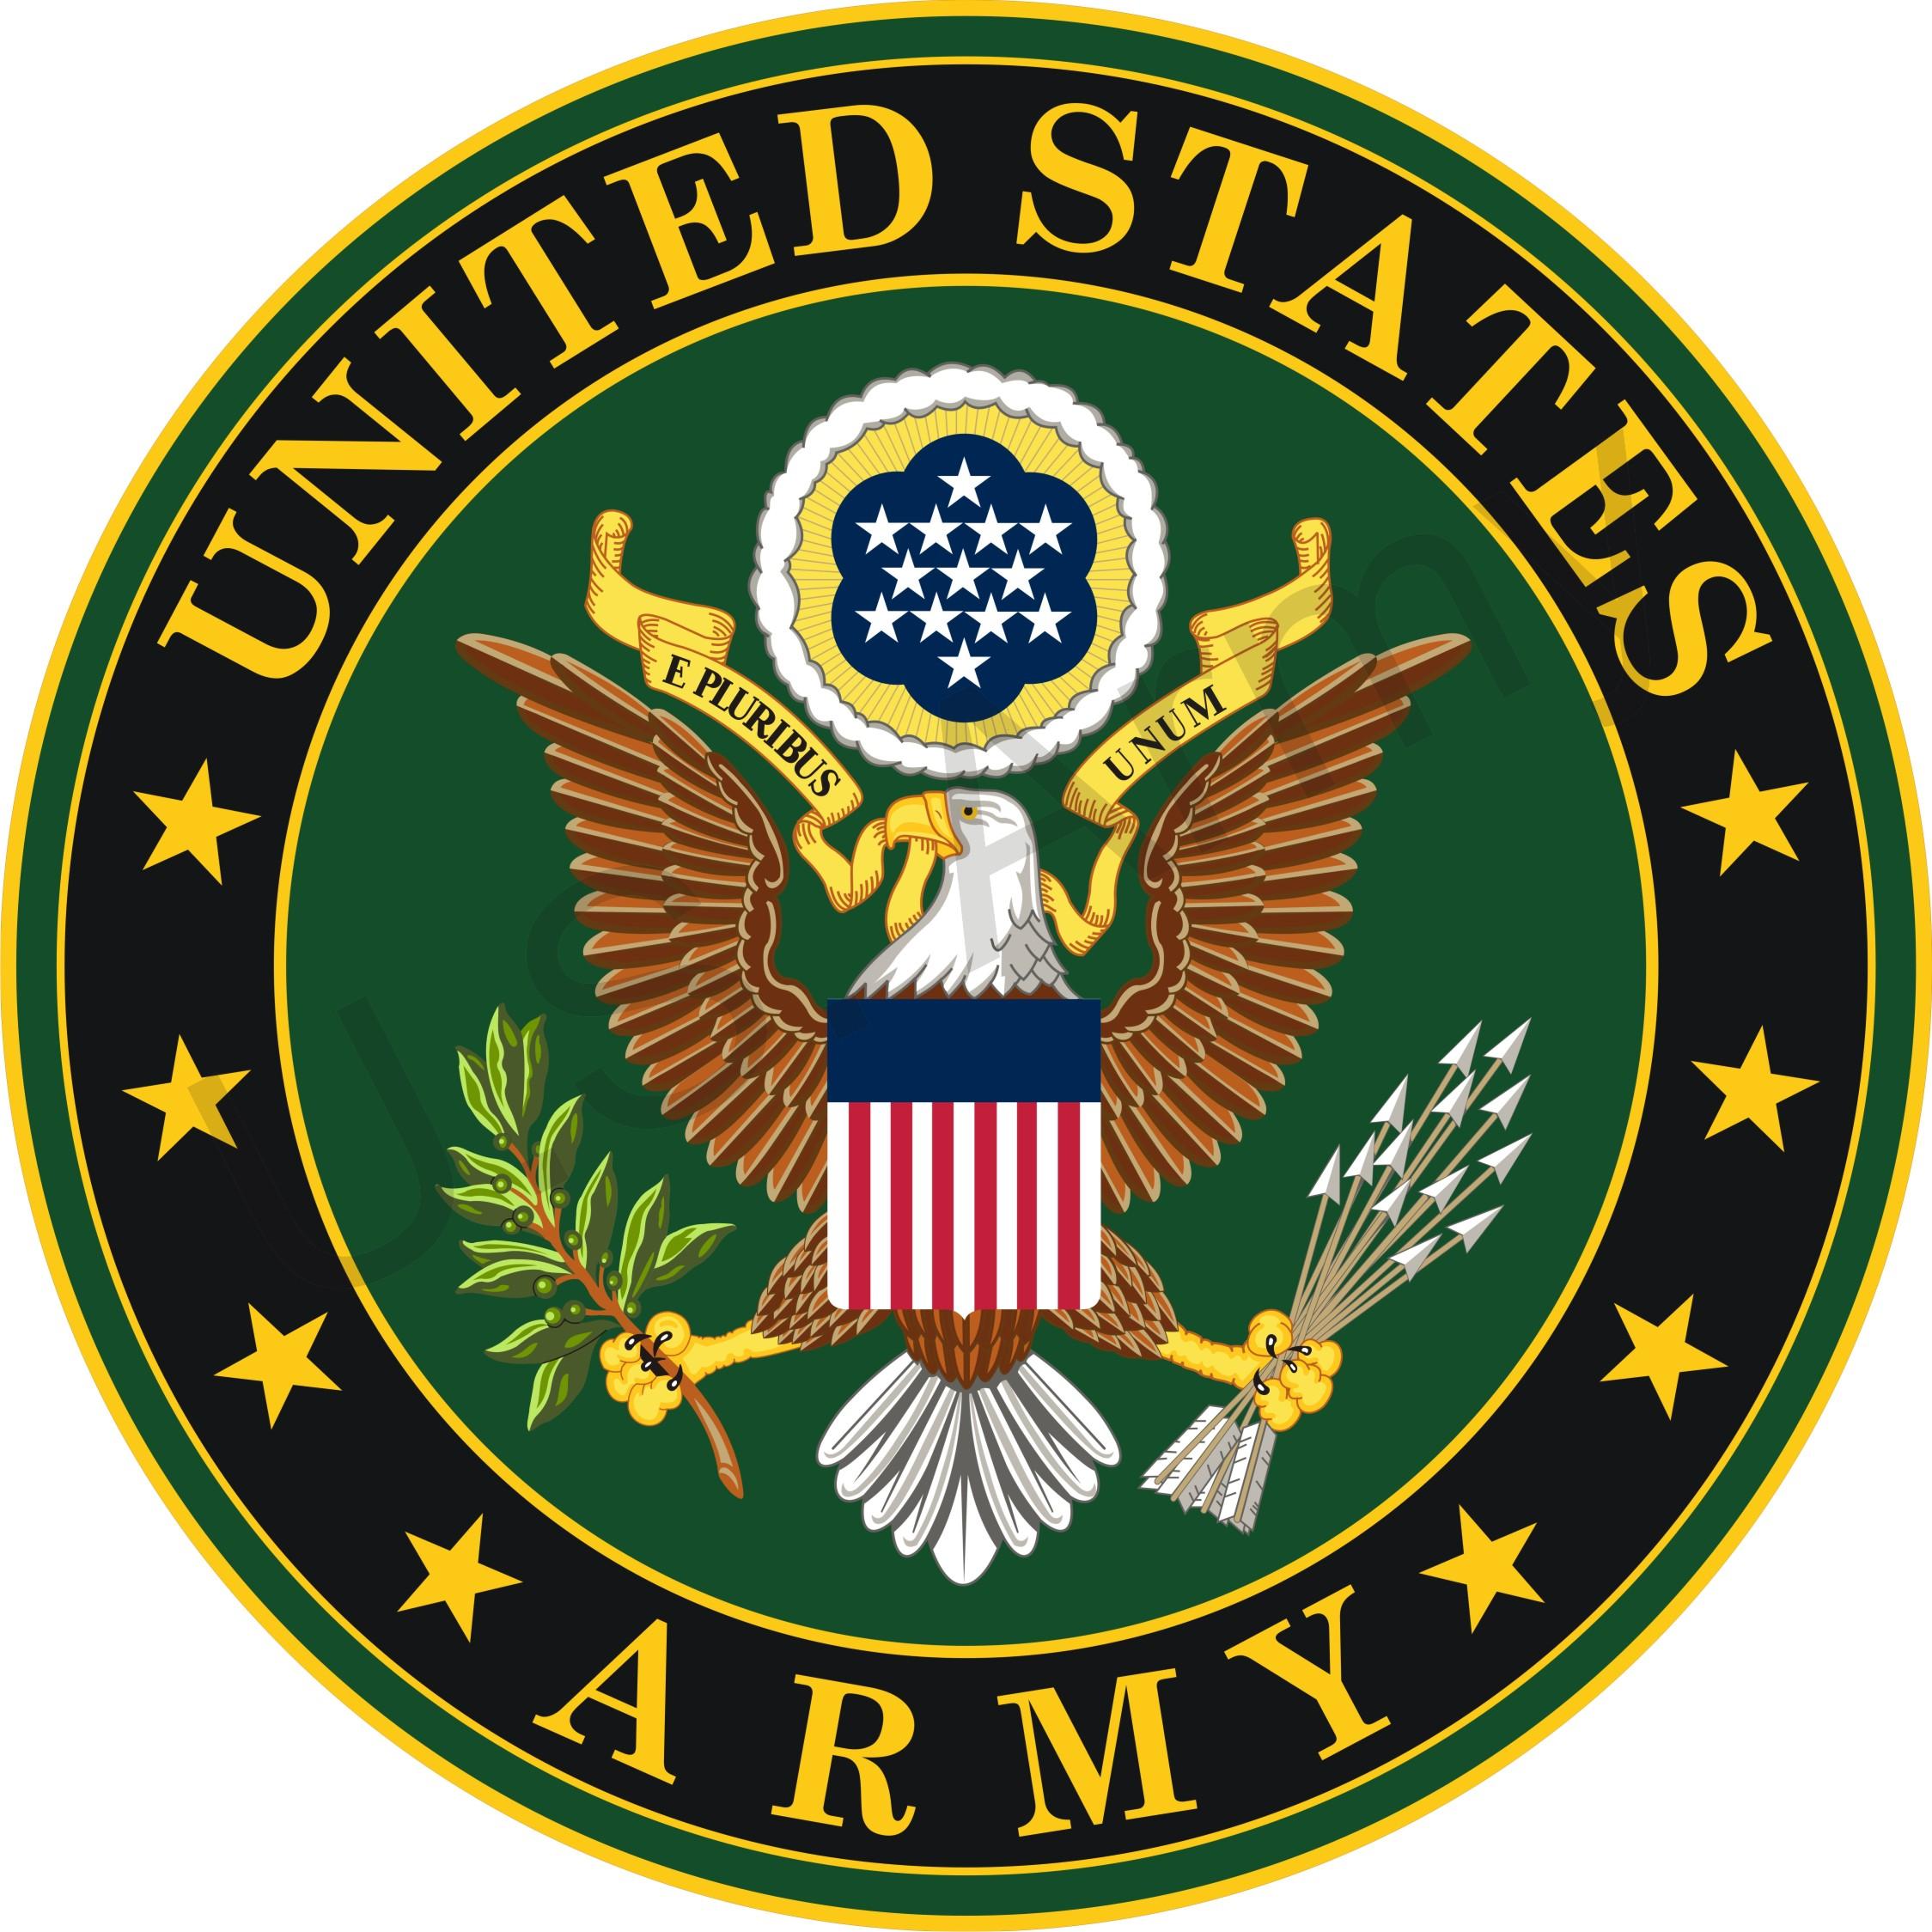 2249x2249 Free Printable Military Clip Art Us Army Emblem Clipart